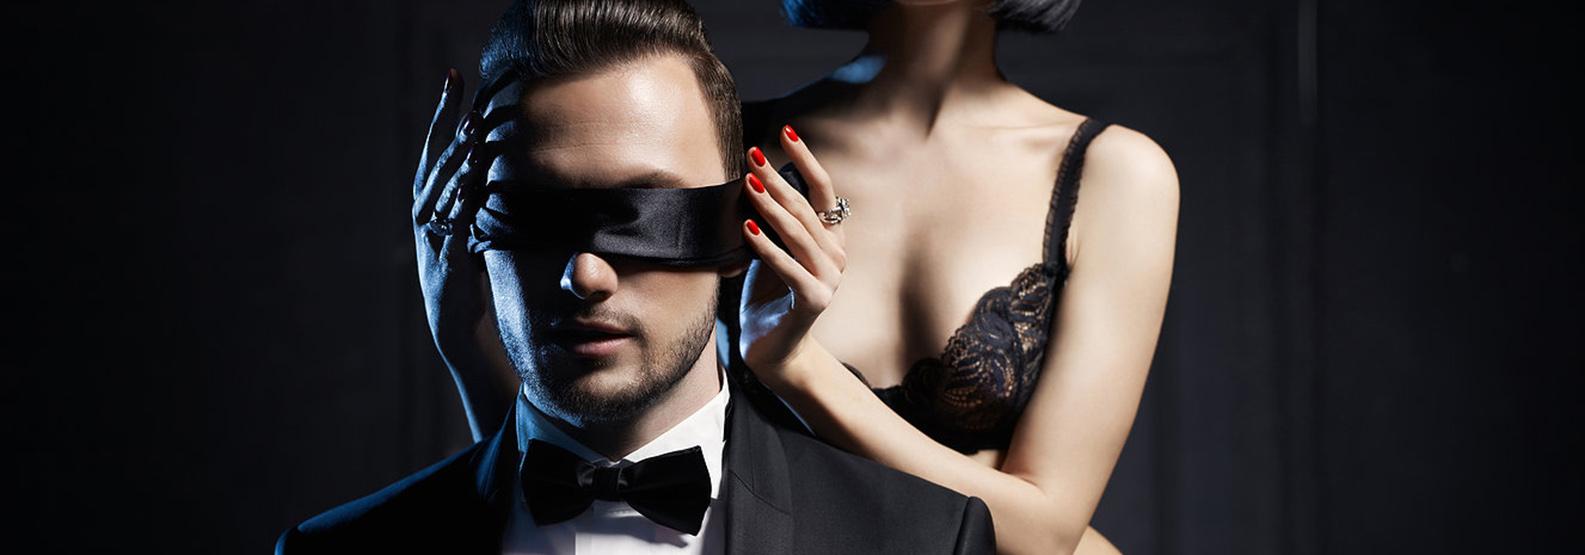 Секс пати в масках